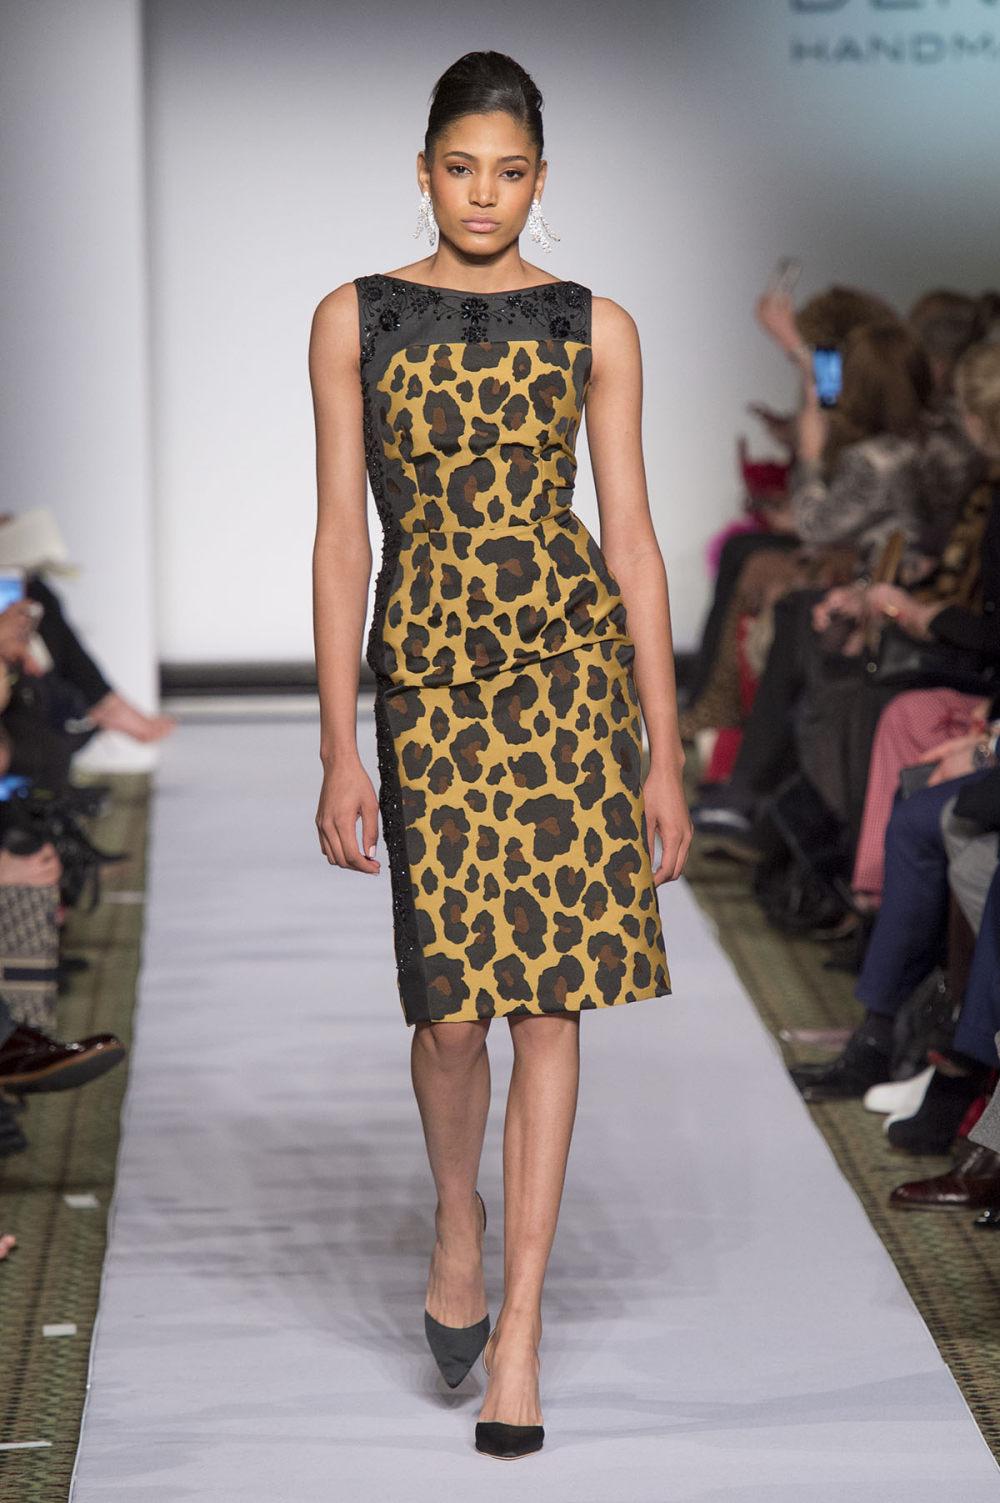 Carolina Herrera时装系列用鲜艳的颜色充满智能的黑白色调-3.jpg